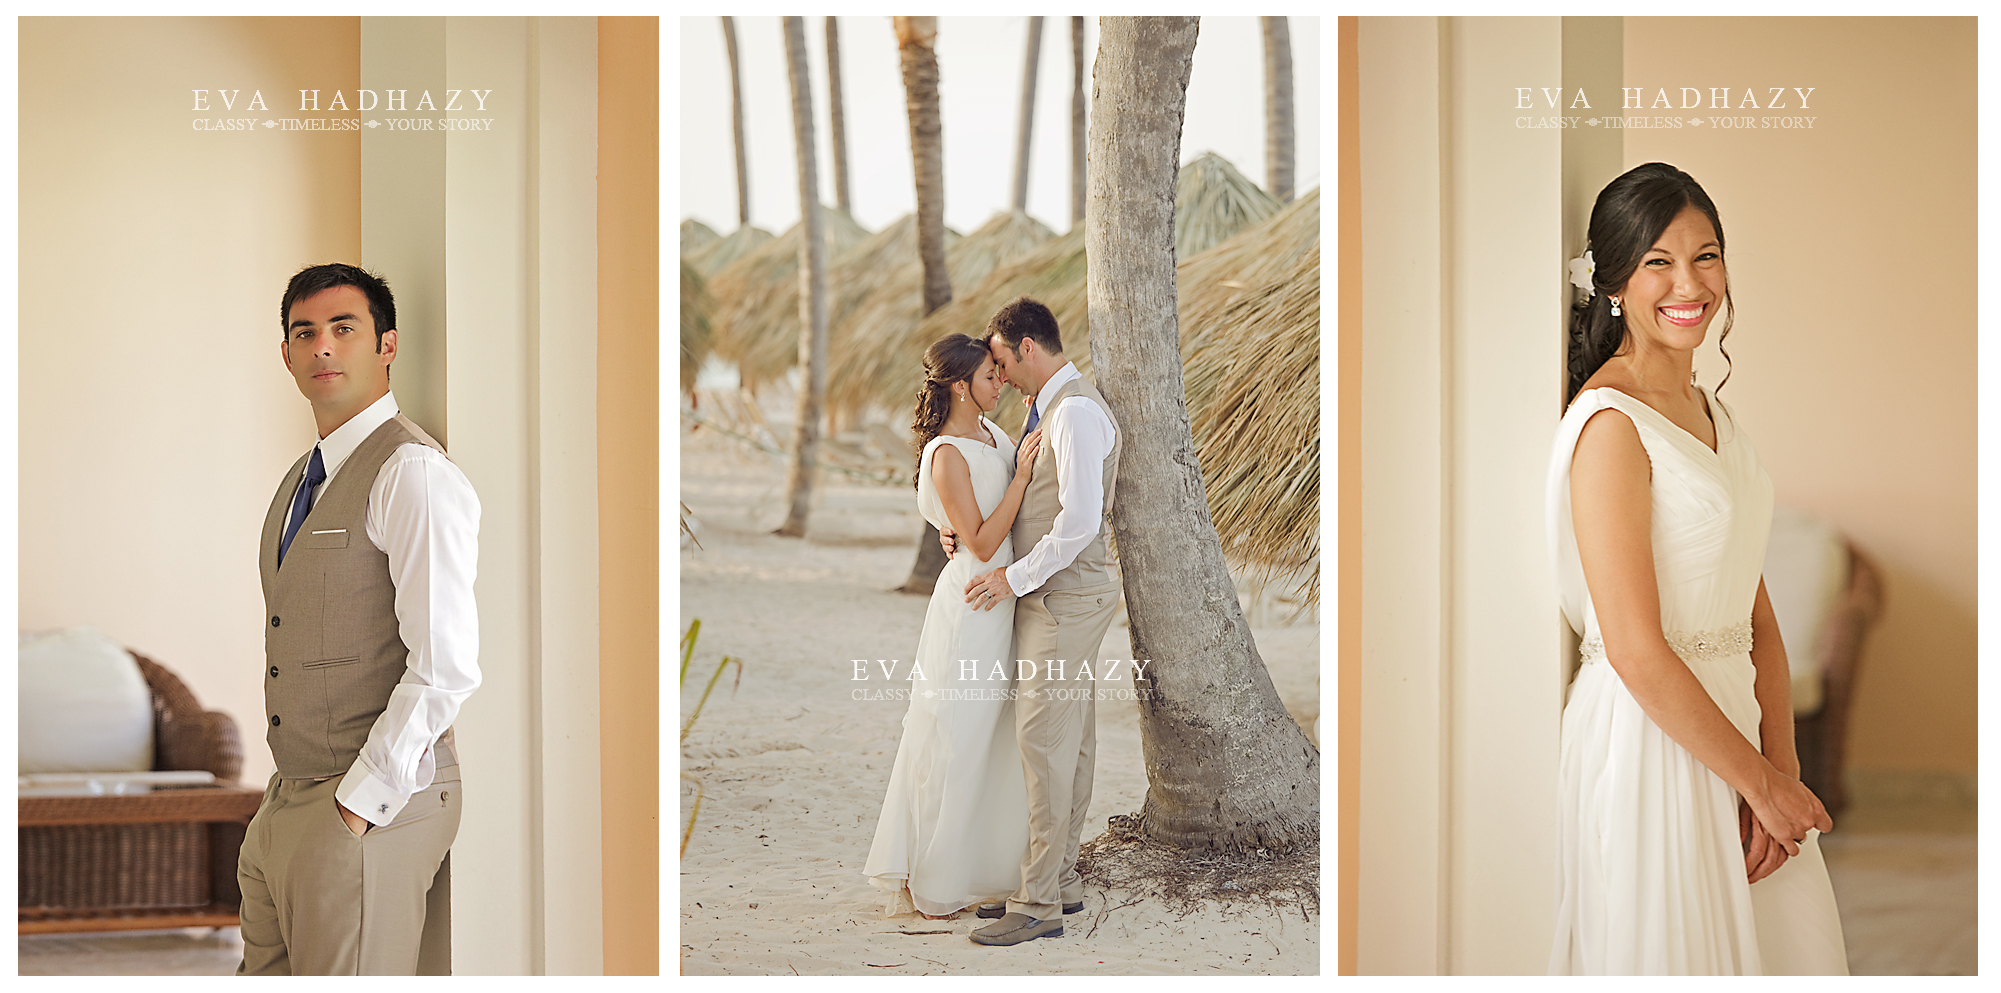 www.hadhazyphoto.com